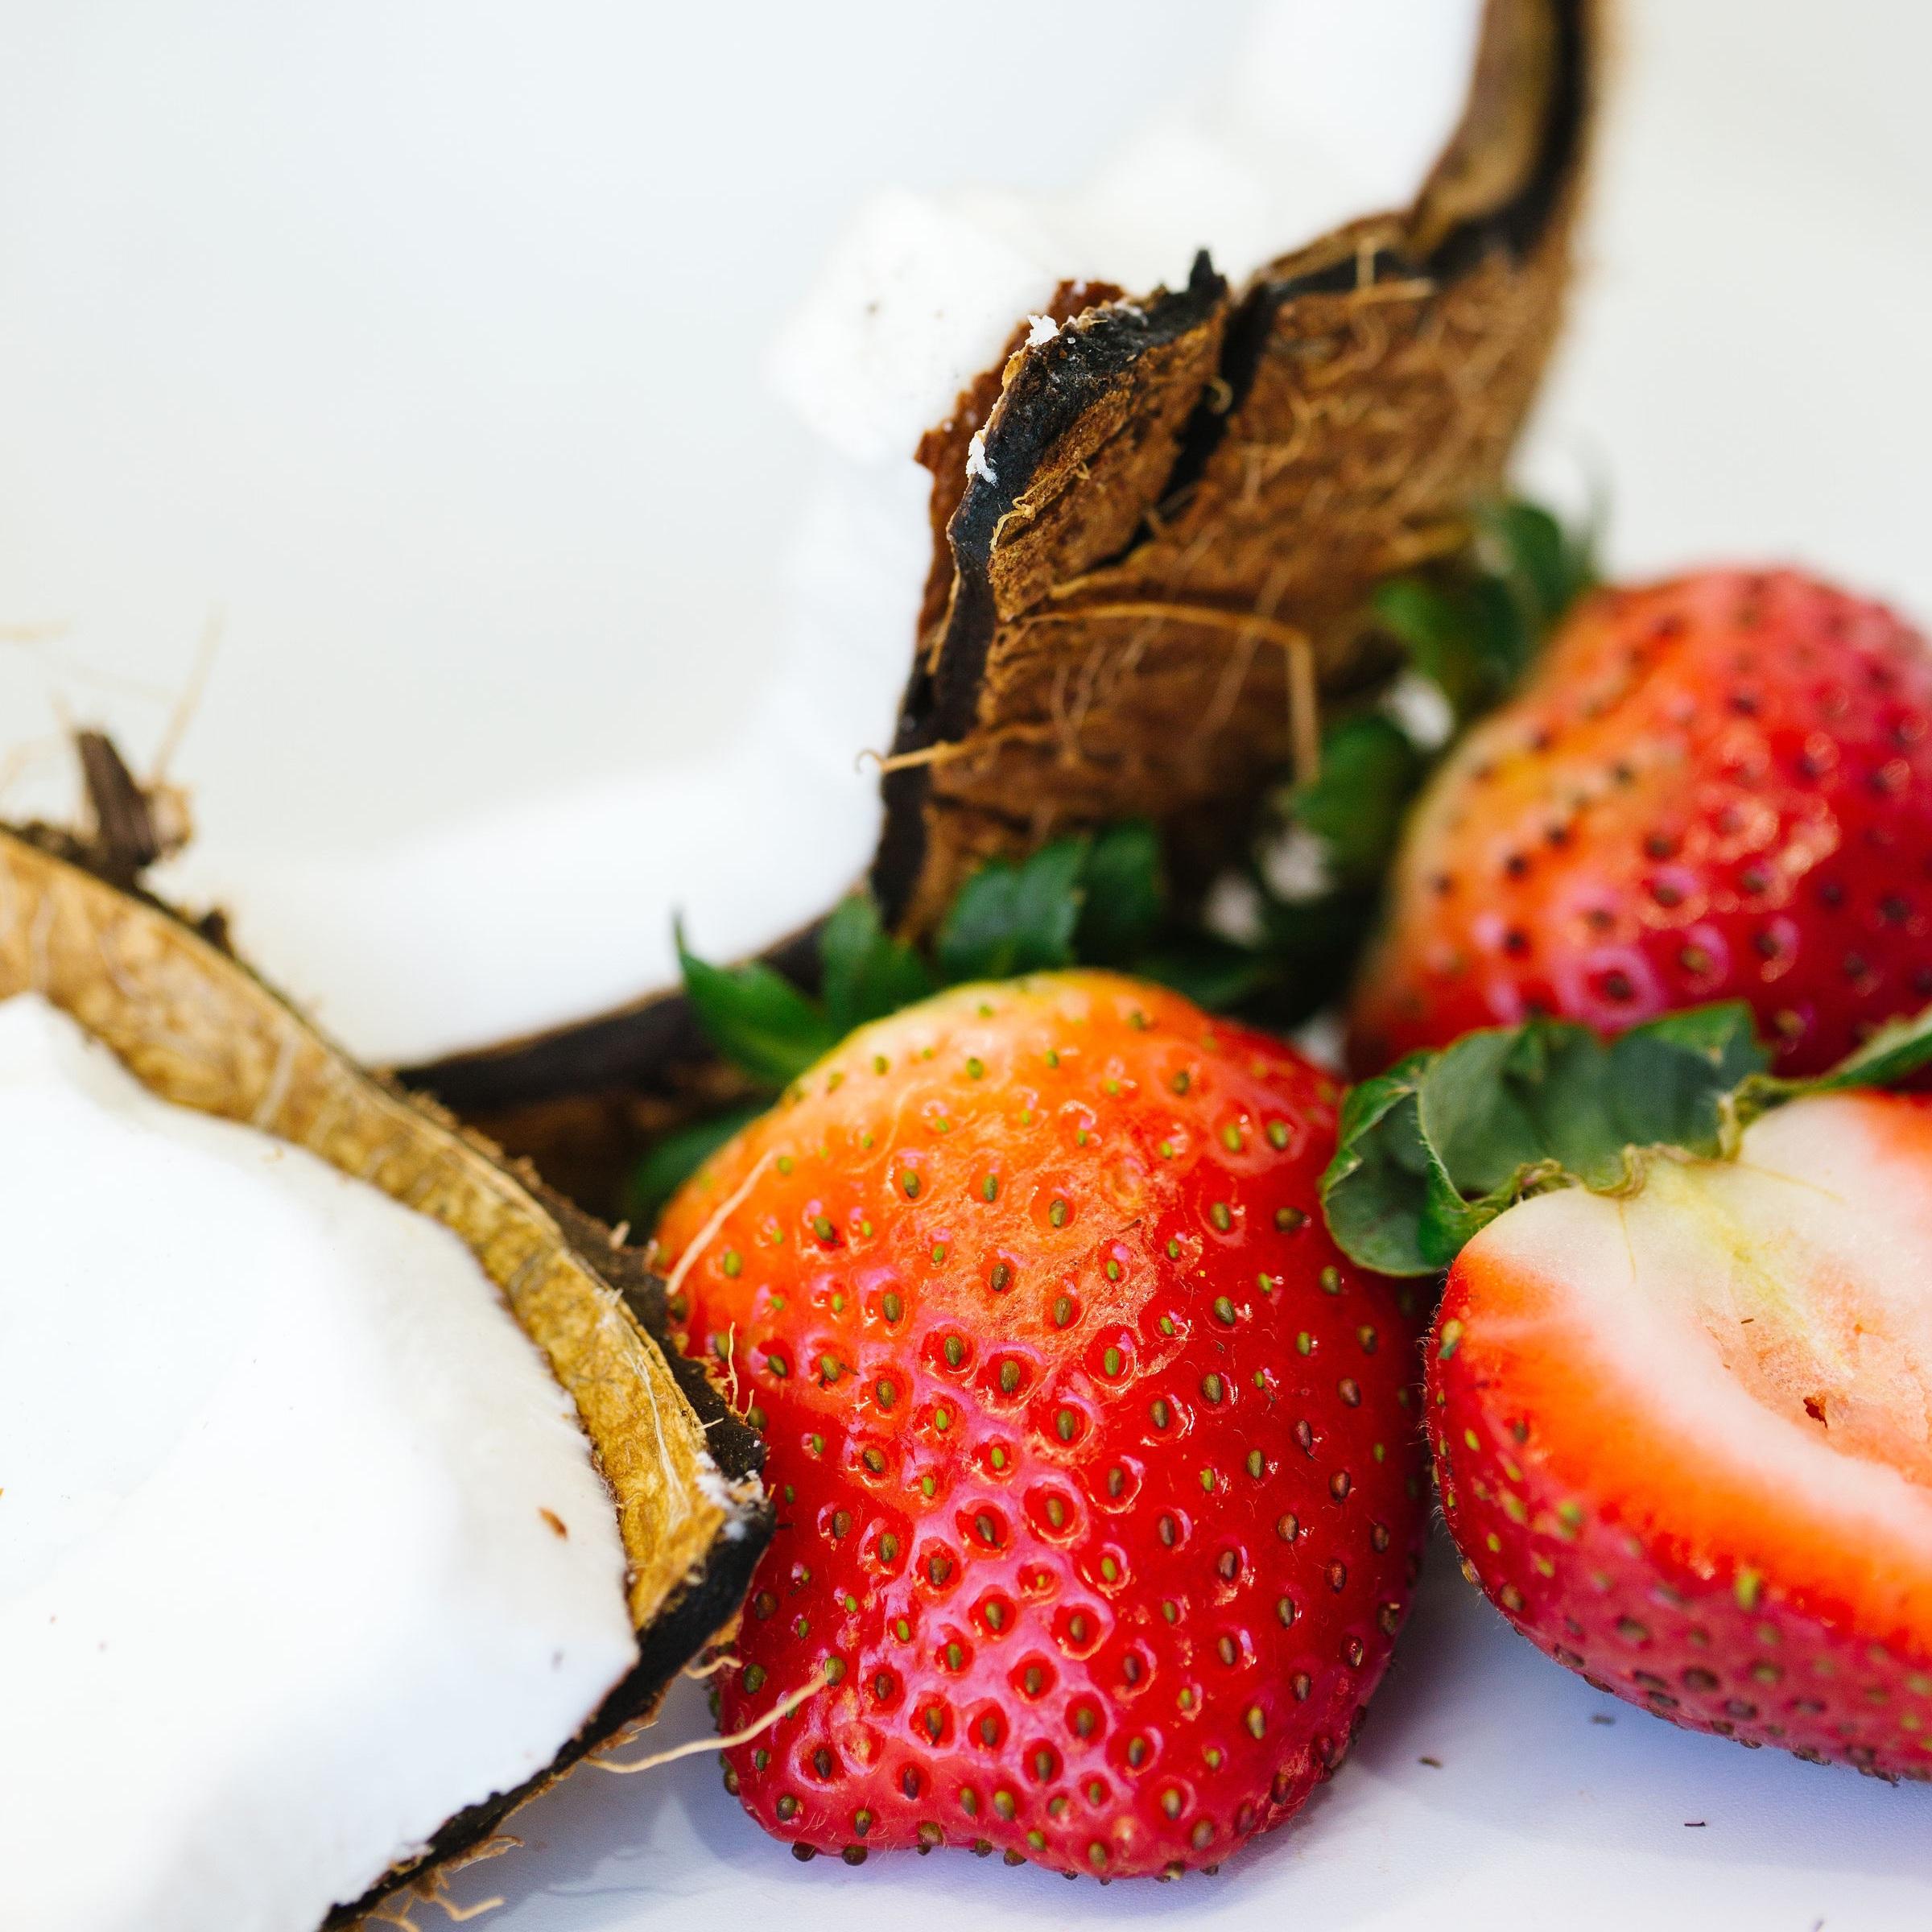 coconut+and+berries.jpg